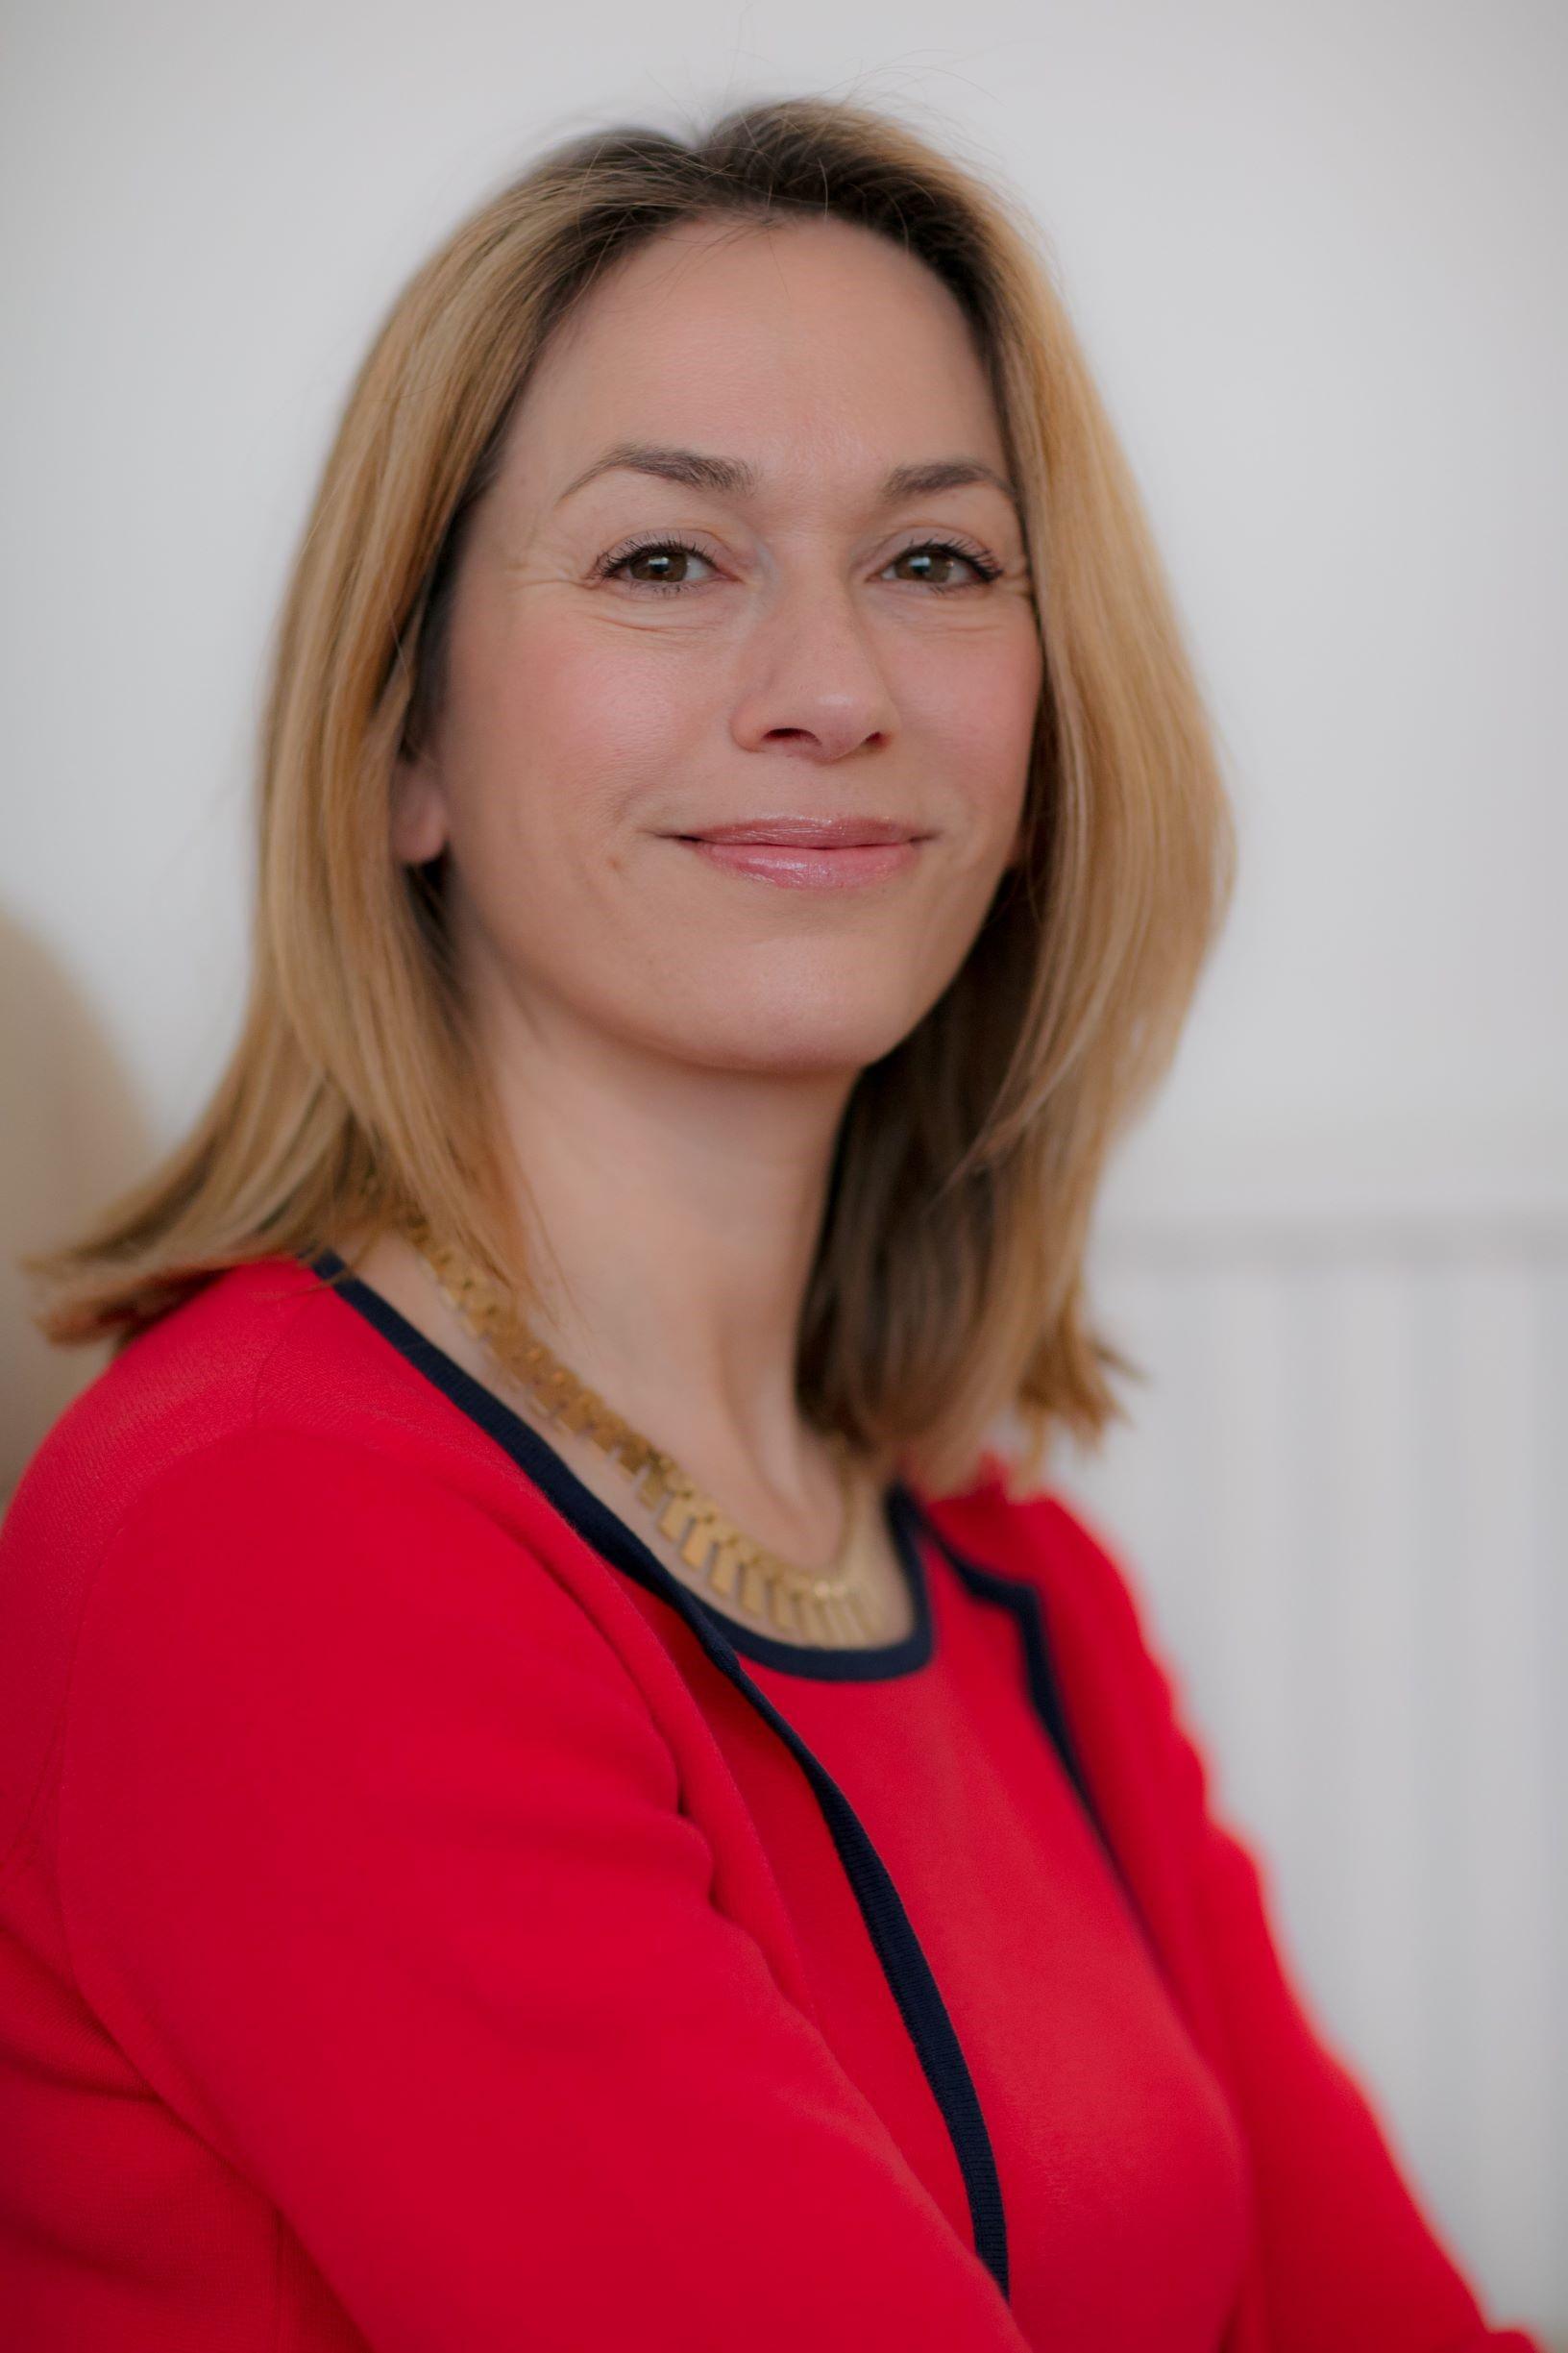 Sharon Kaplansky